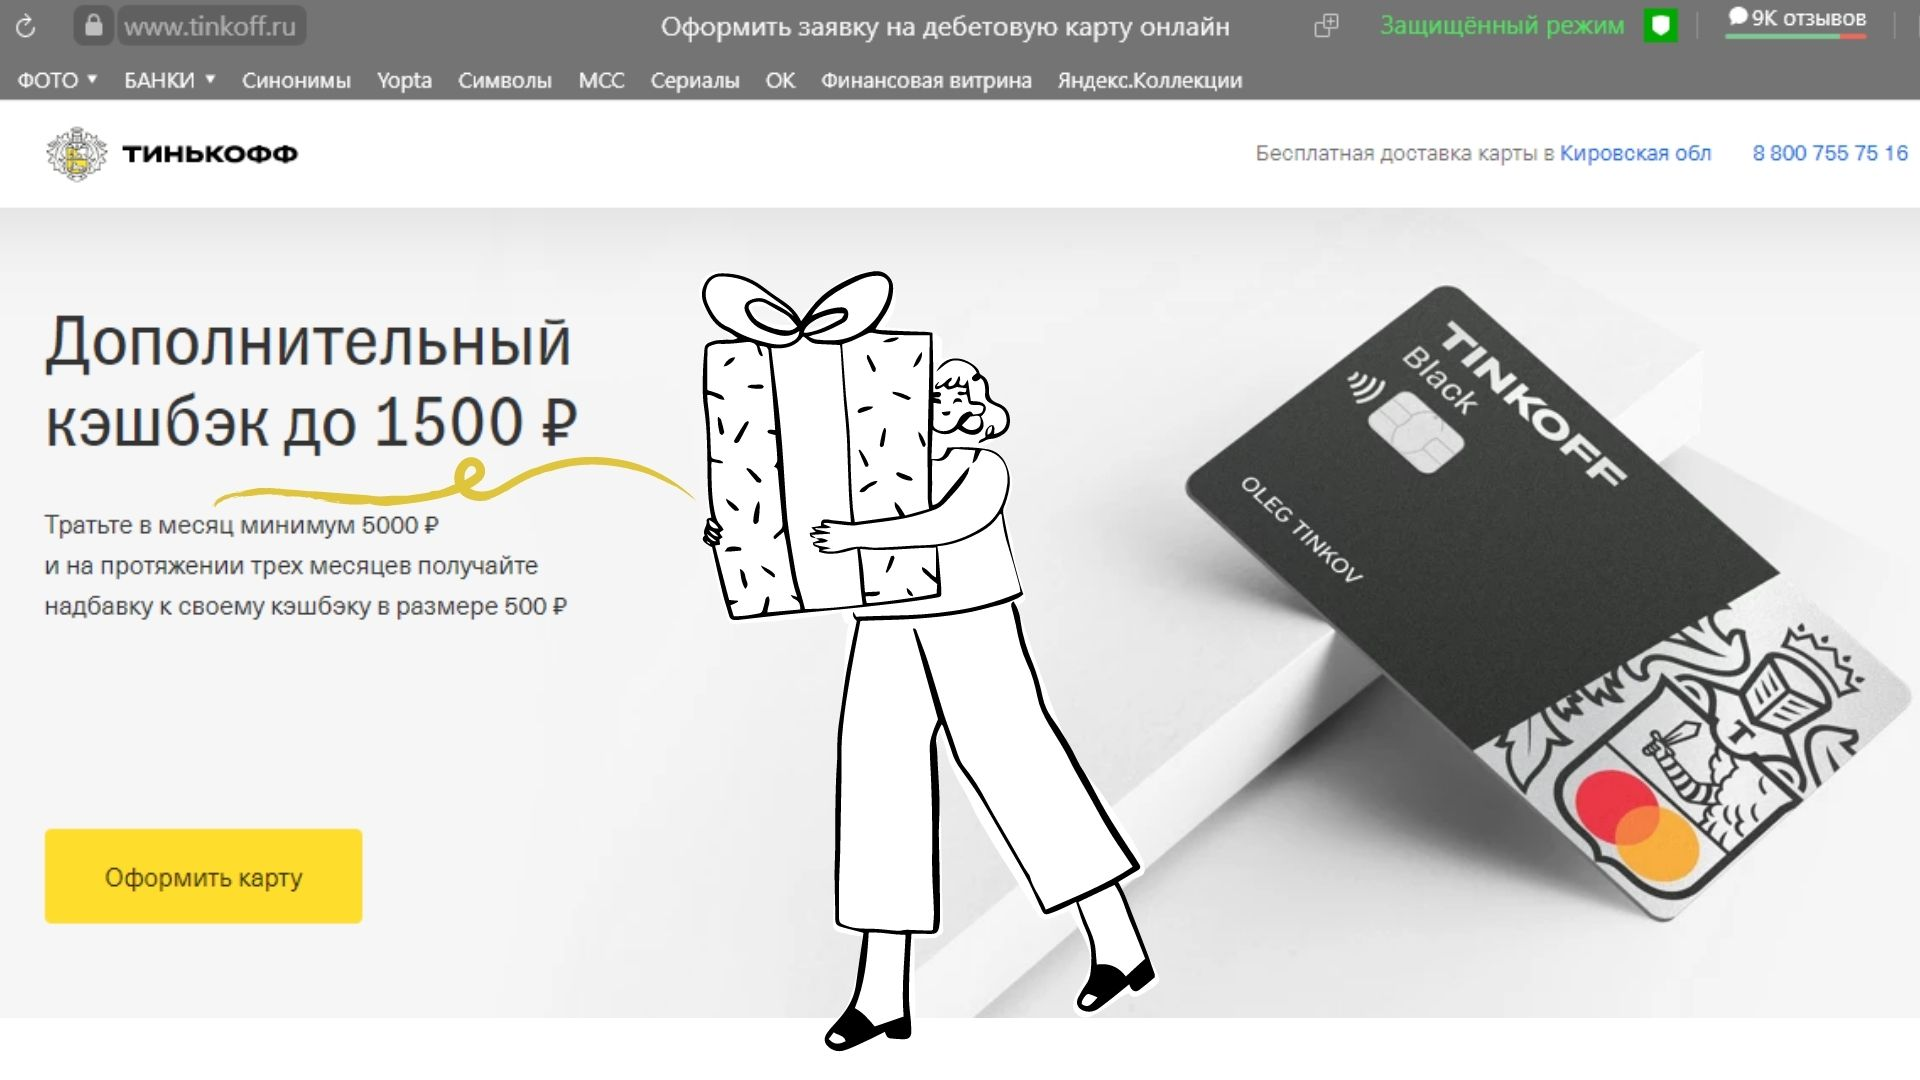 тинькофф блэк 1500 рублей